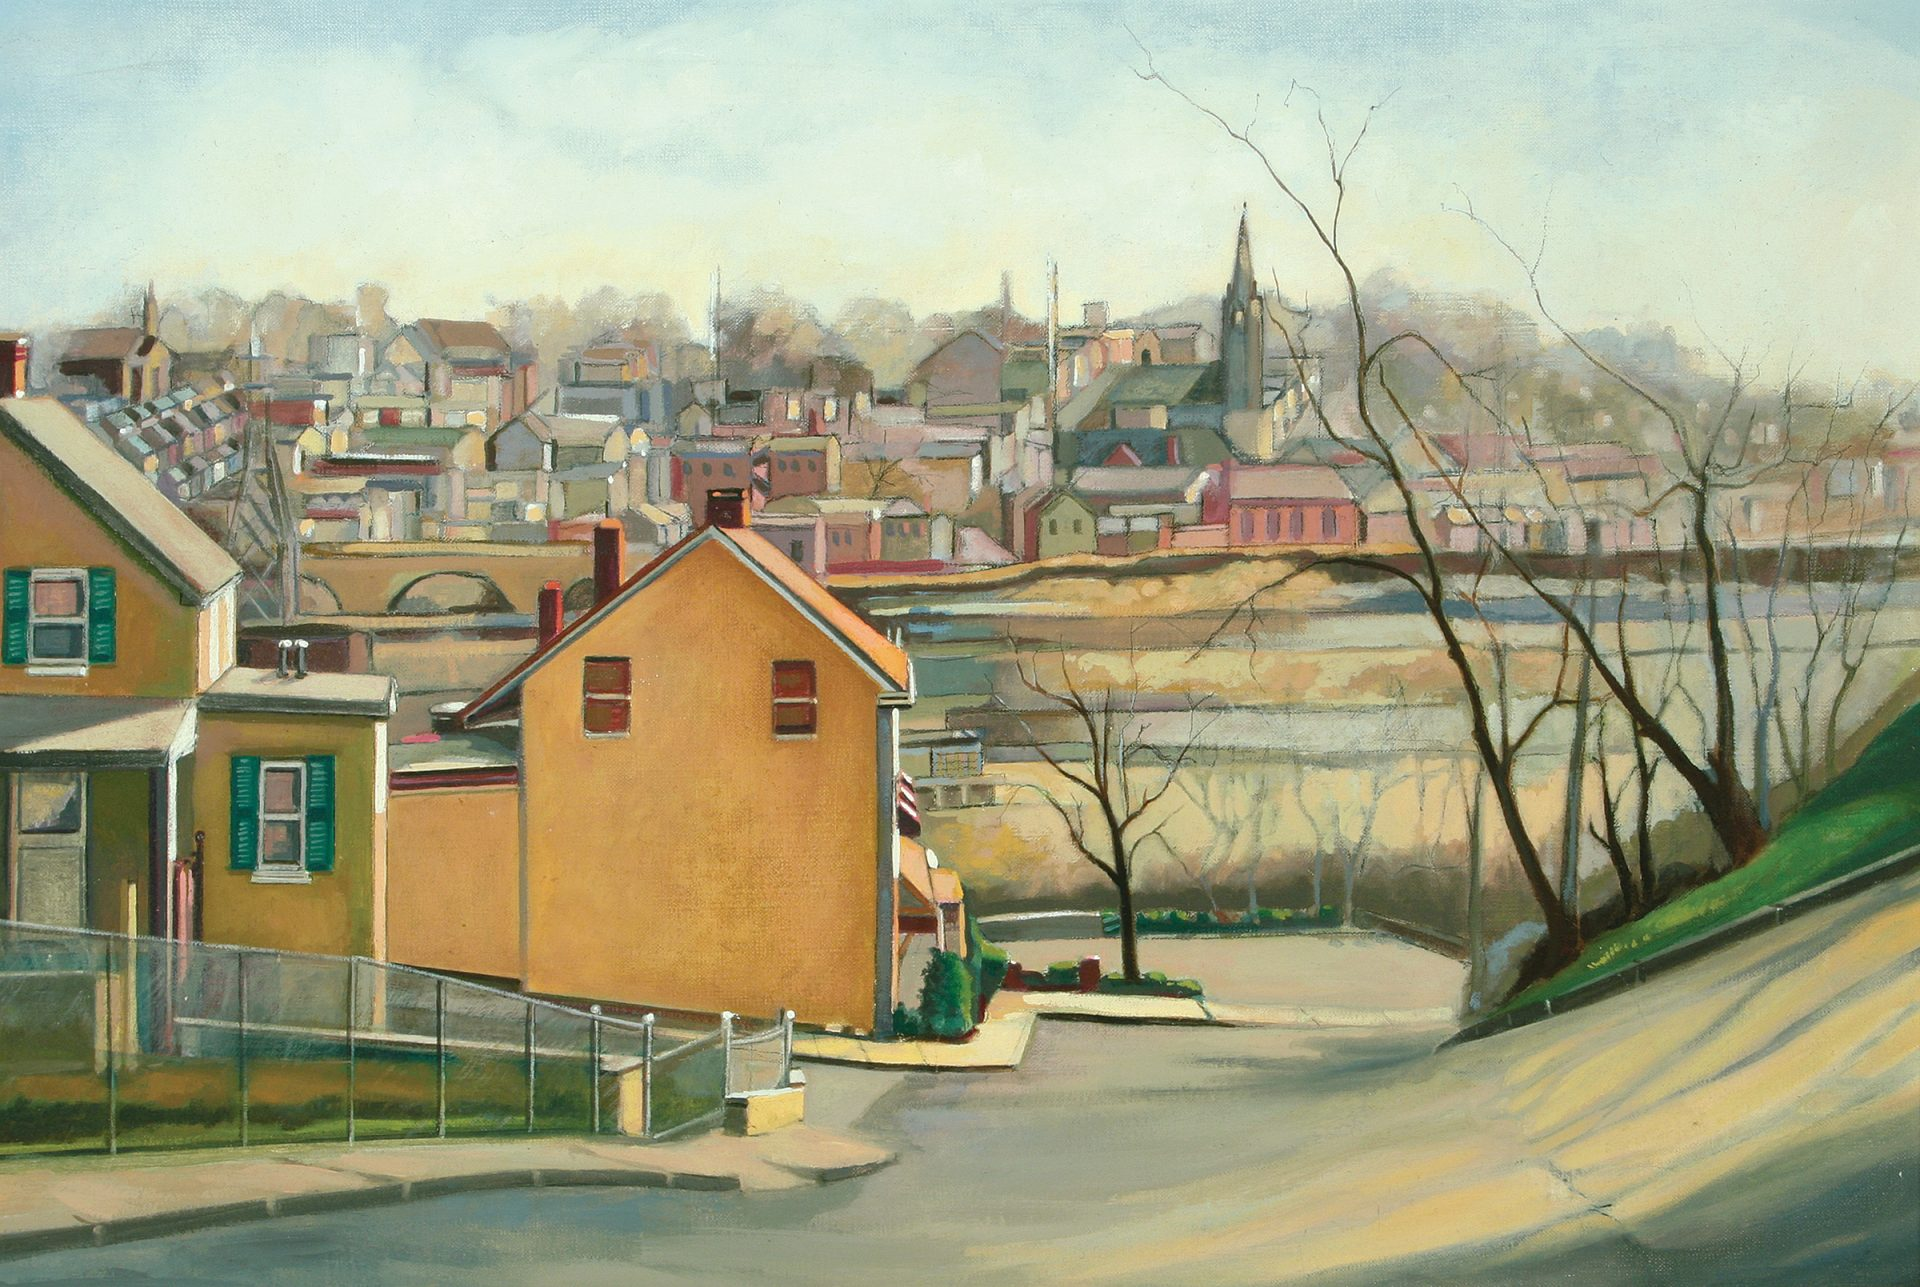 Sleuth Slope (Nina F. Martino)